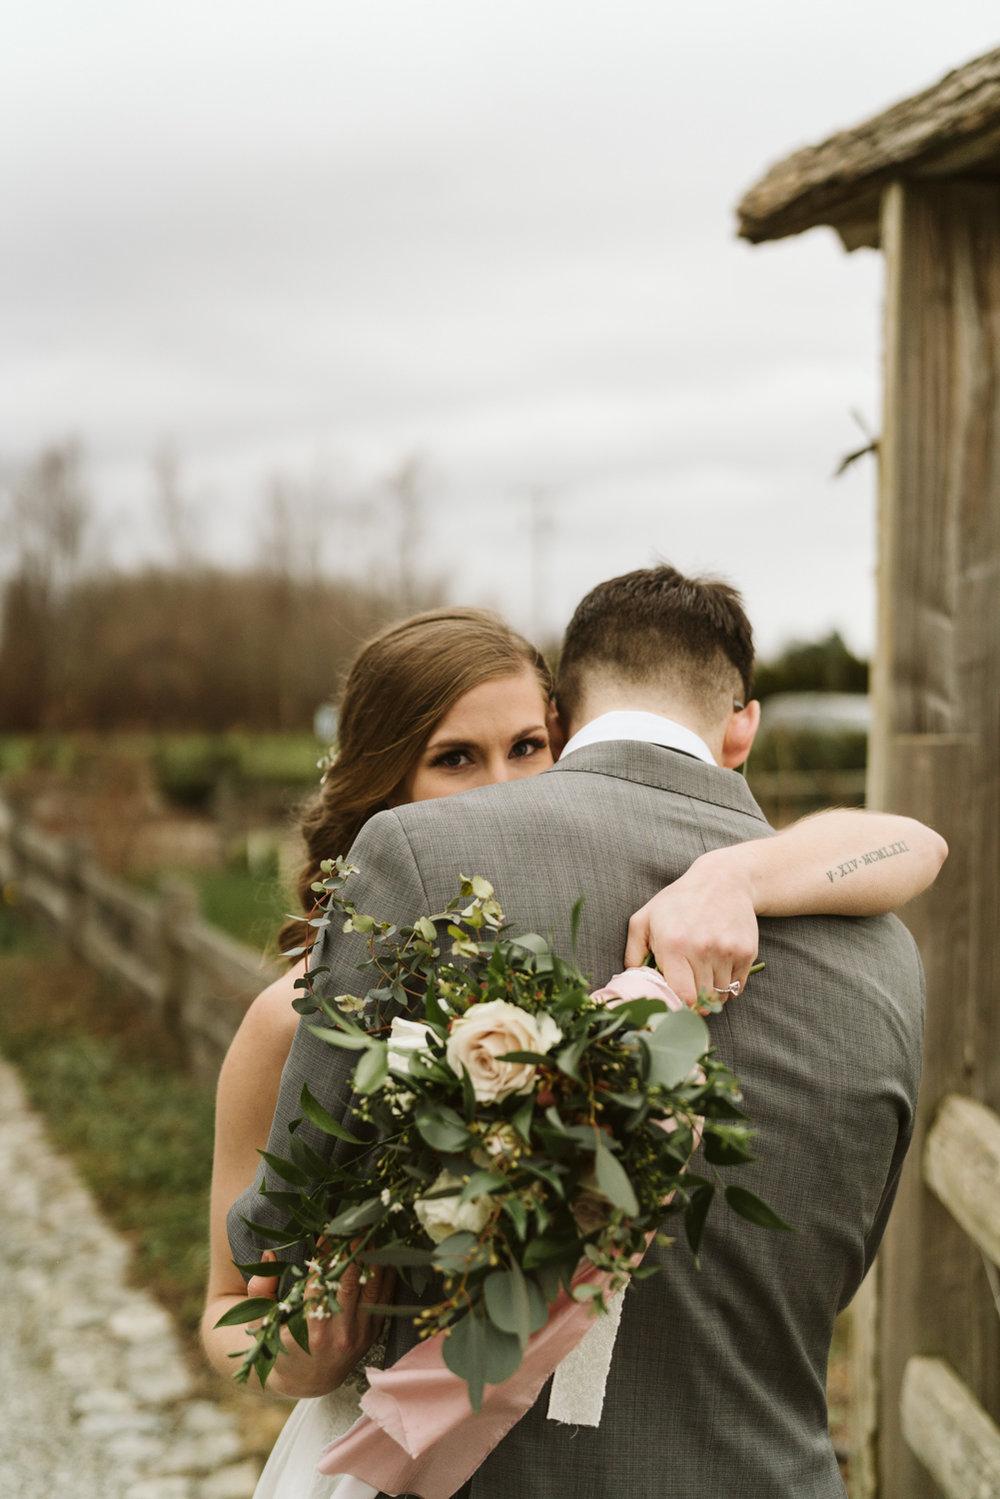 April Yentas Photography - Faberfarm Styled Shoot-81.jpg